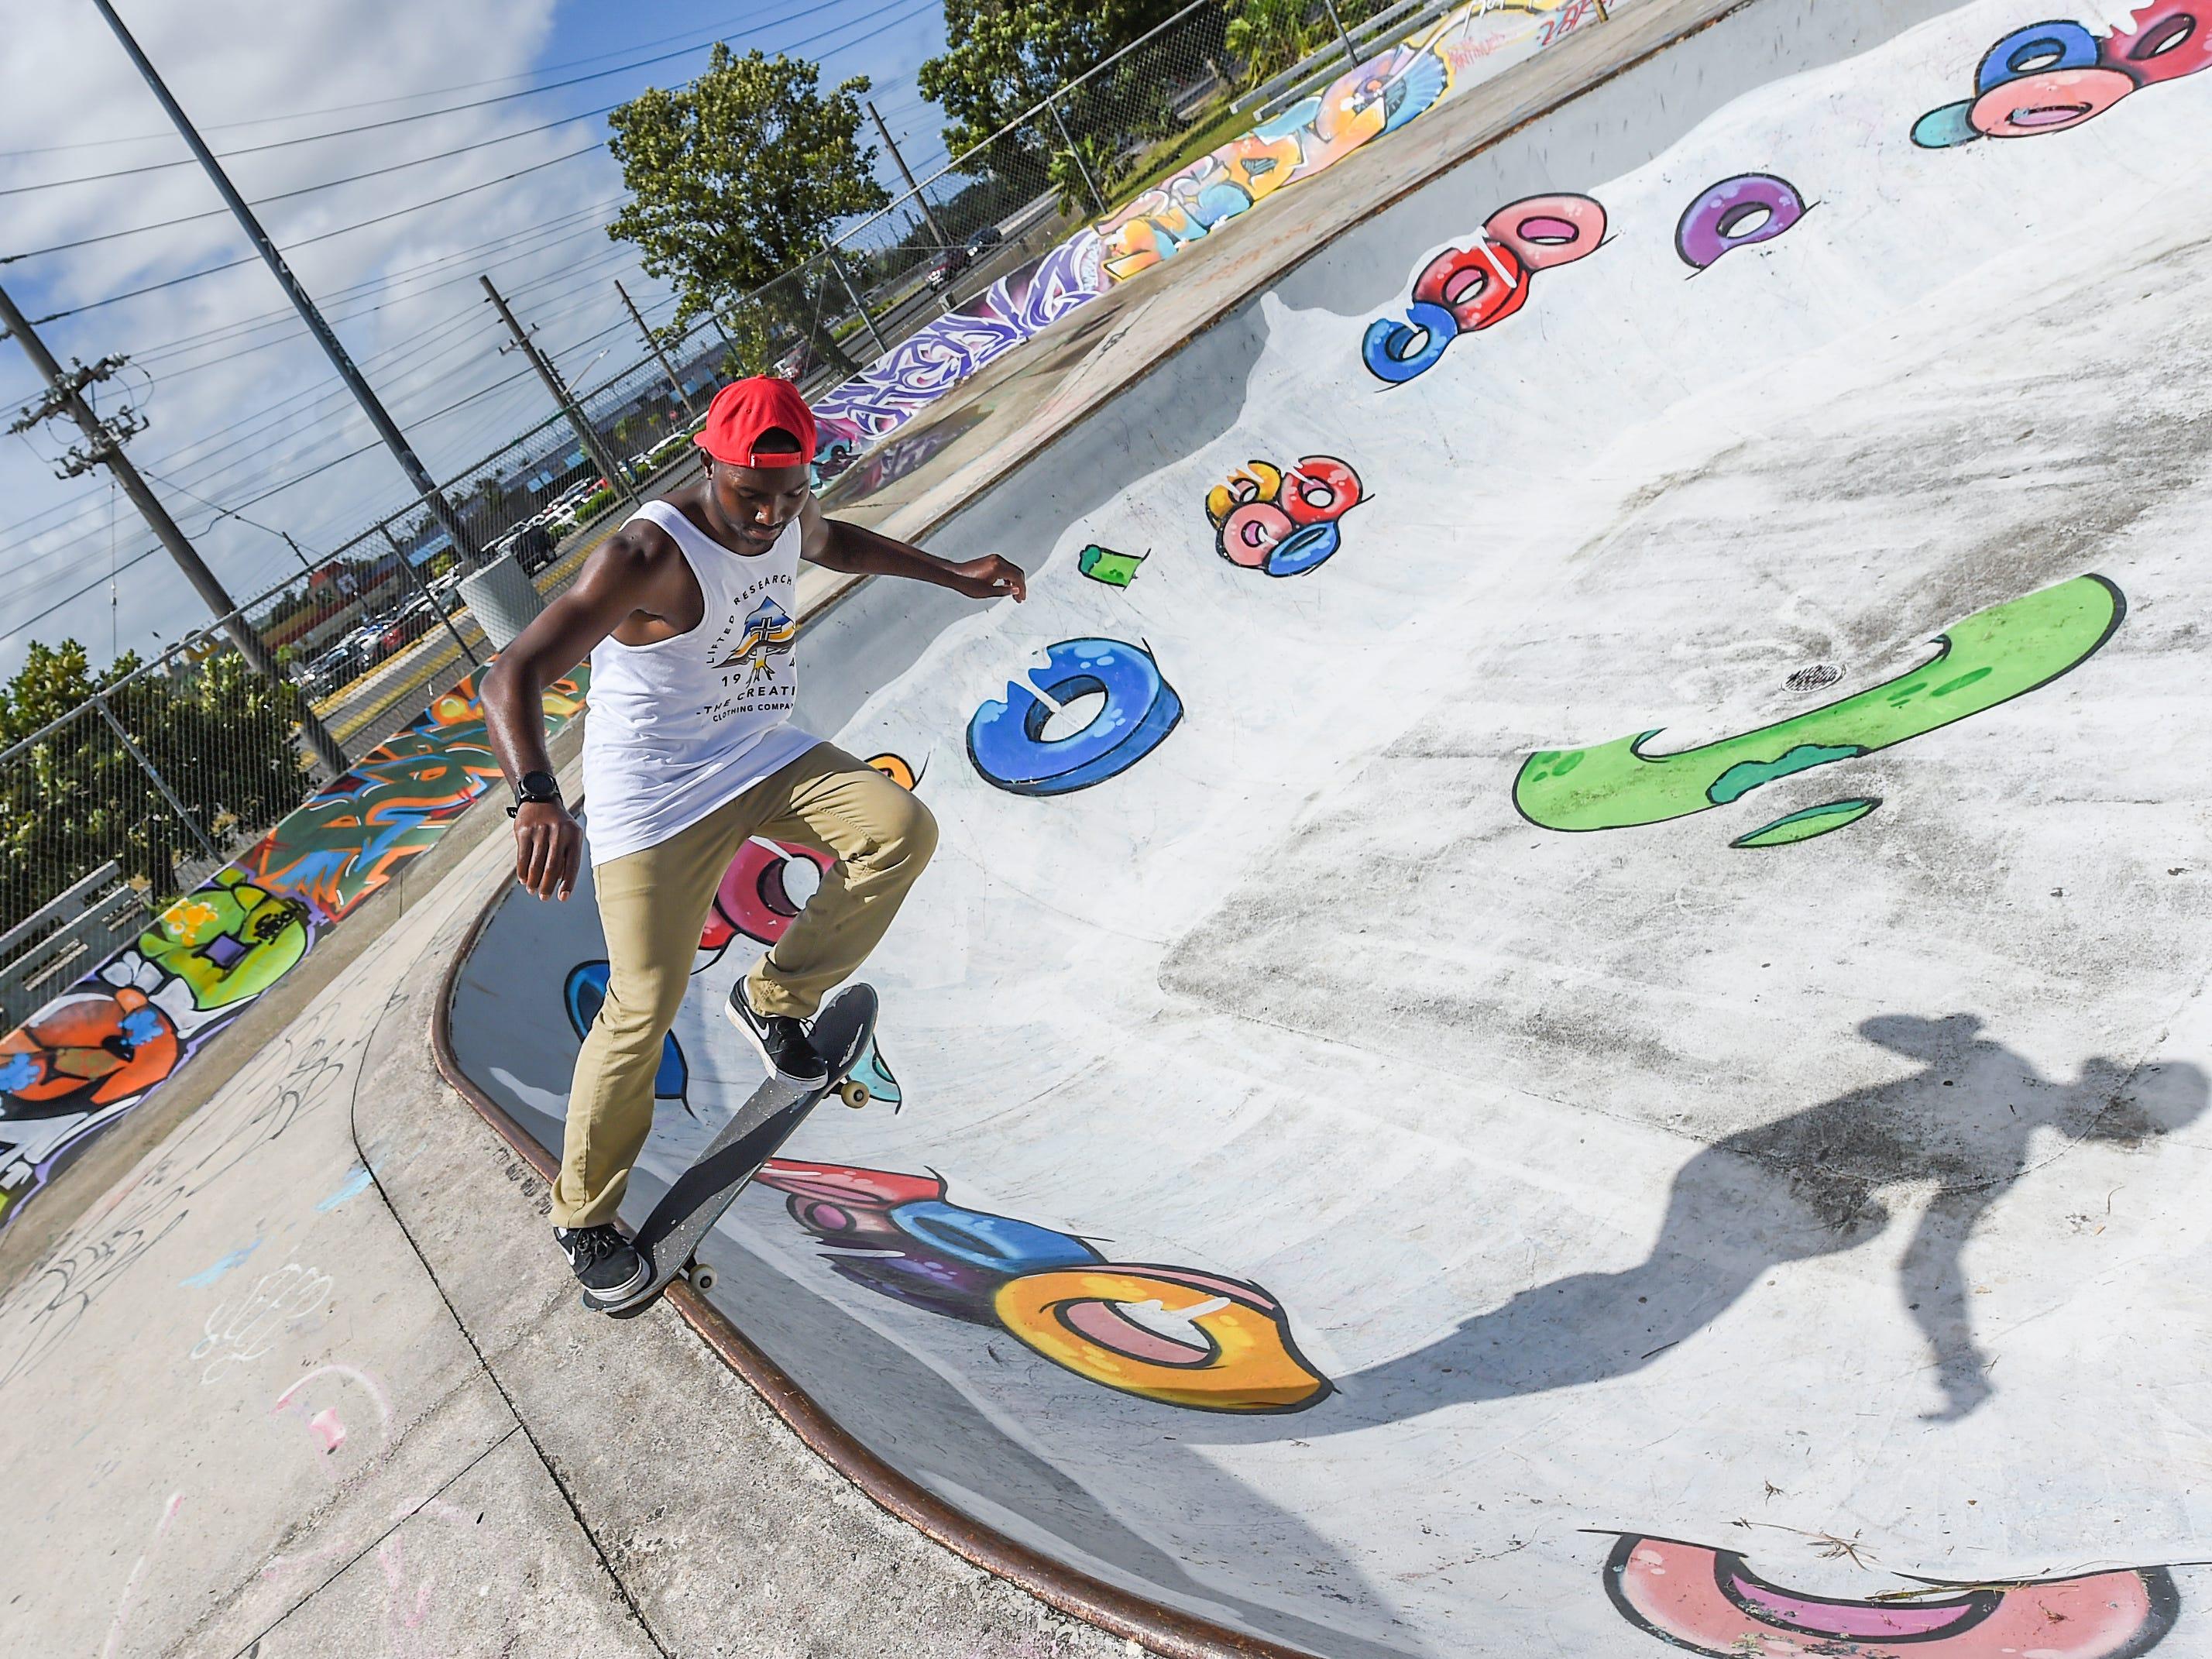 Marquis Nelson at the Dededo Skatepark on Feb. 3, 2019.